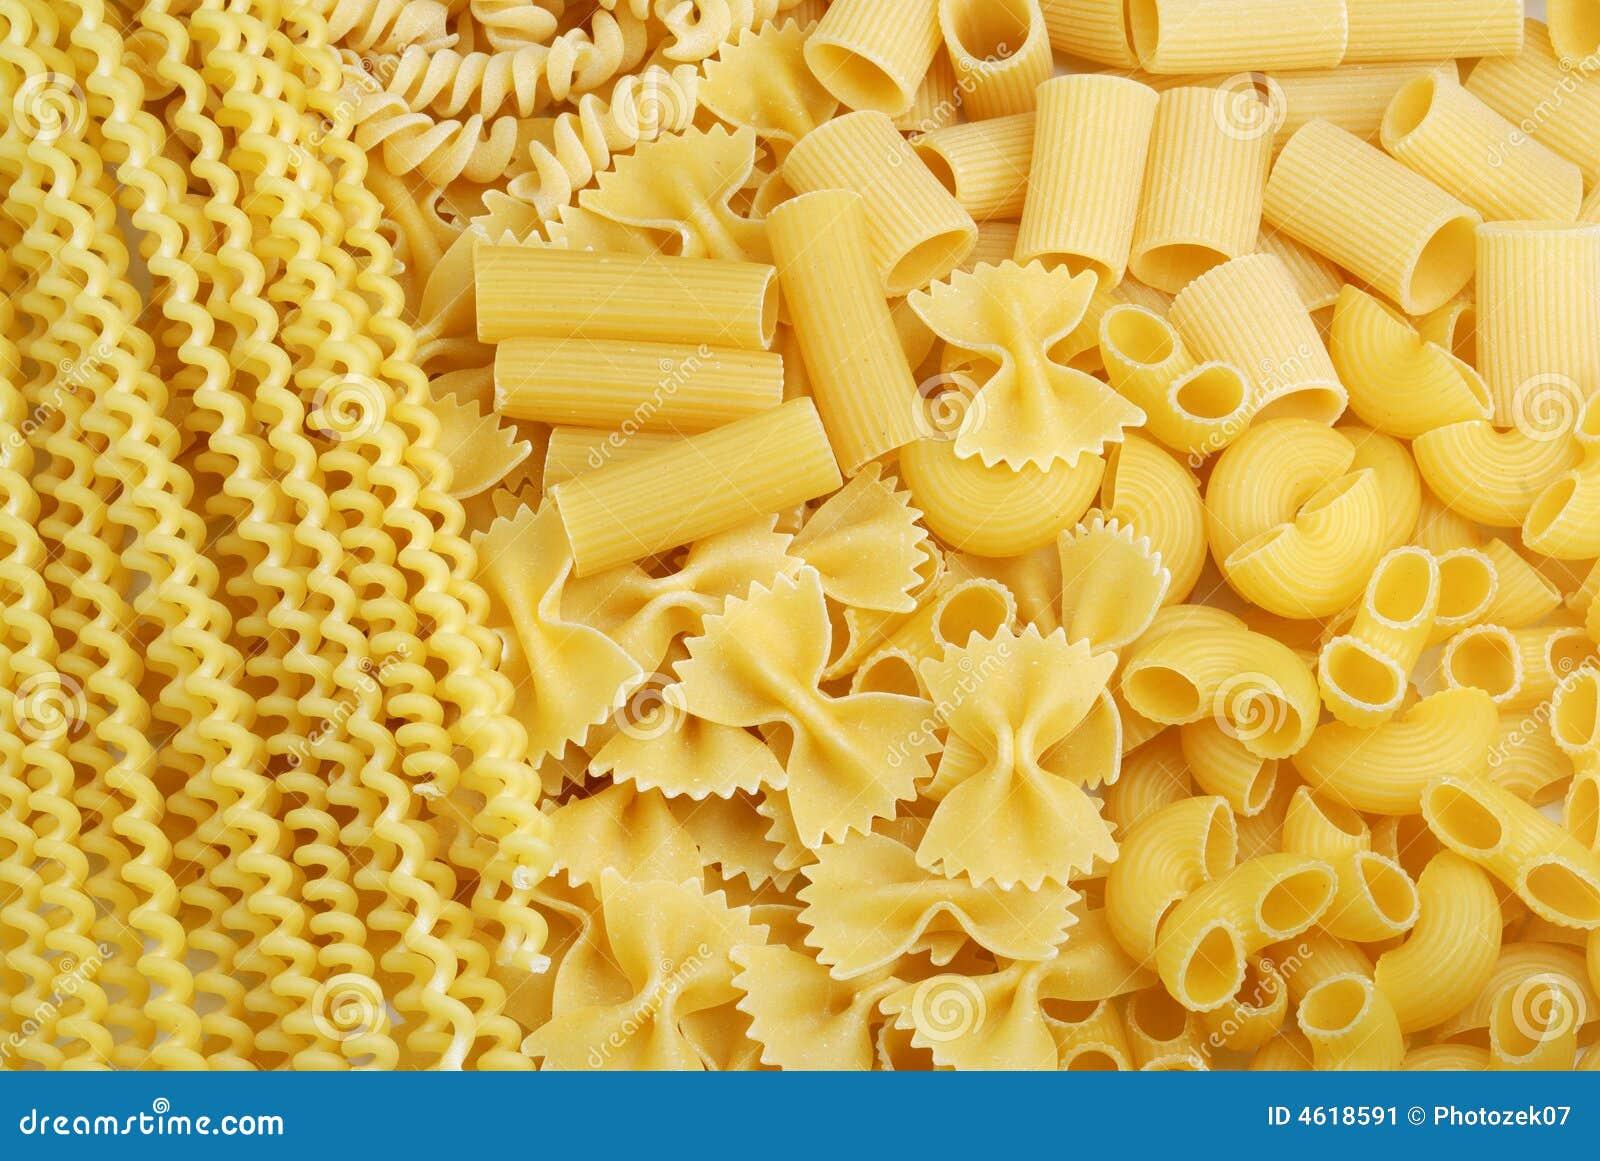 Fond italien de pâtes